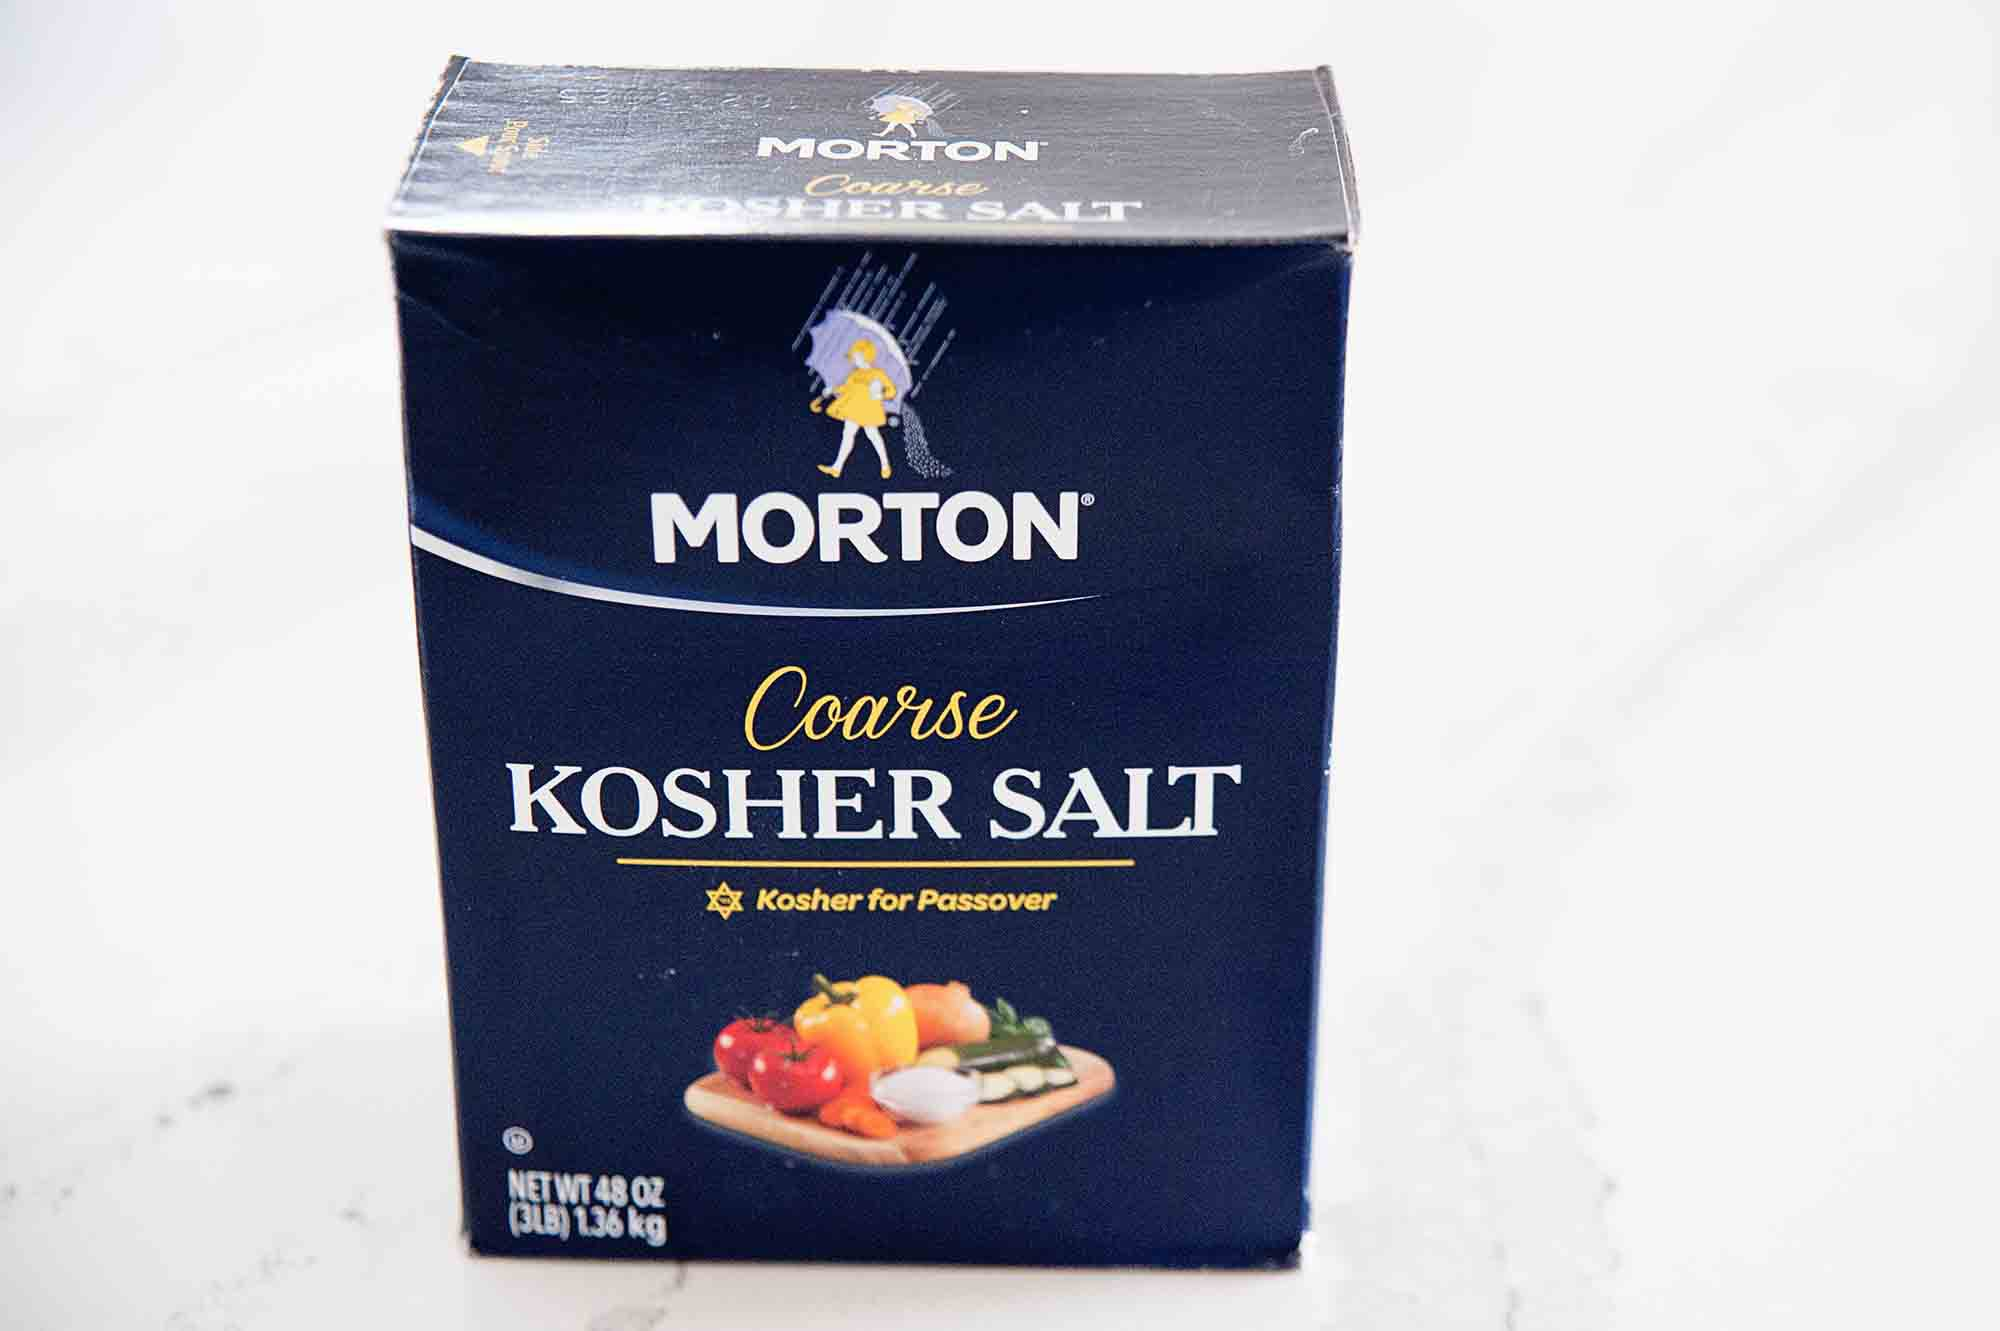 Box of Morton Kosher Salt